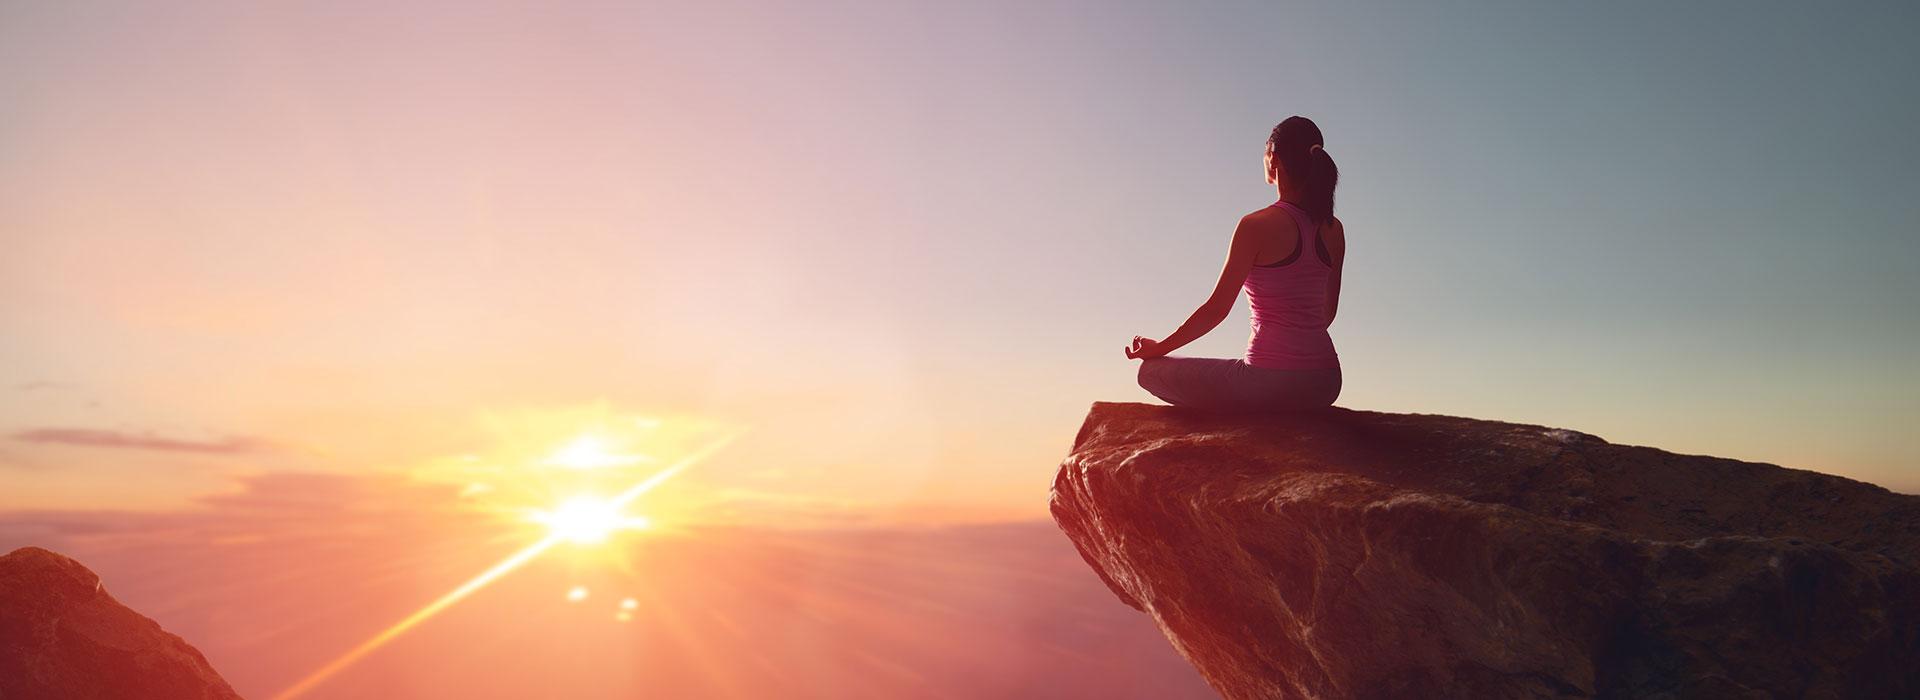 Conscious Entrepreneurship - A New Paradigm